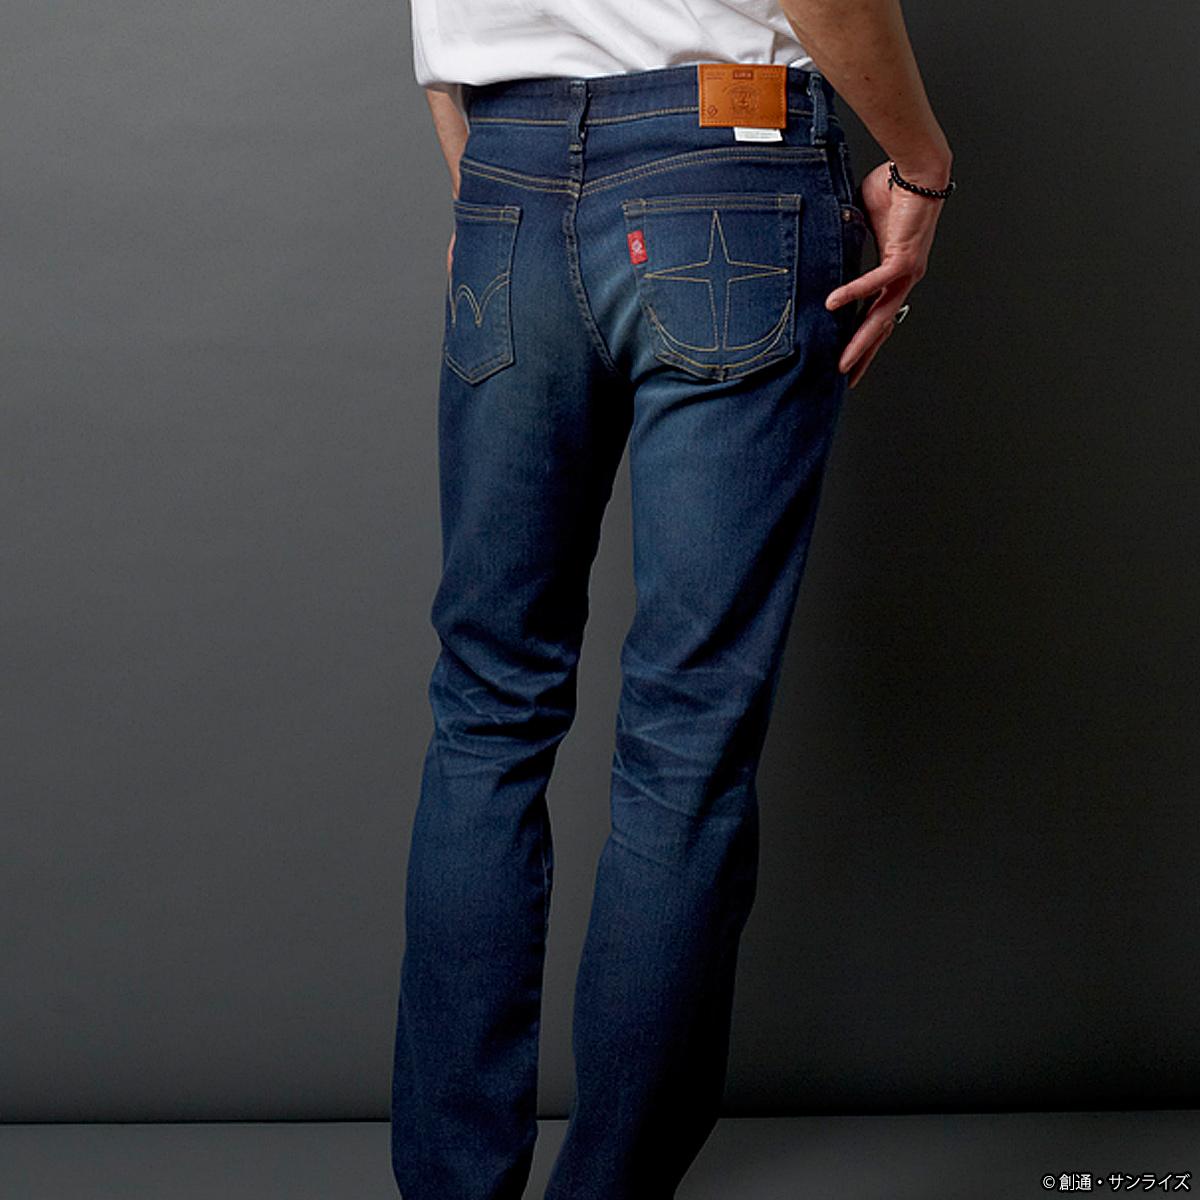 EDWIN JERSEYS 牛仔褲 連邦軍 水洗規格